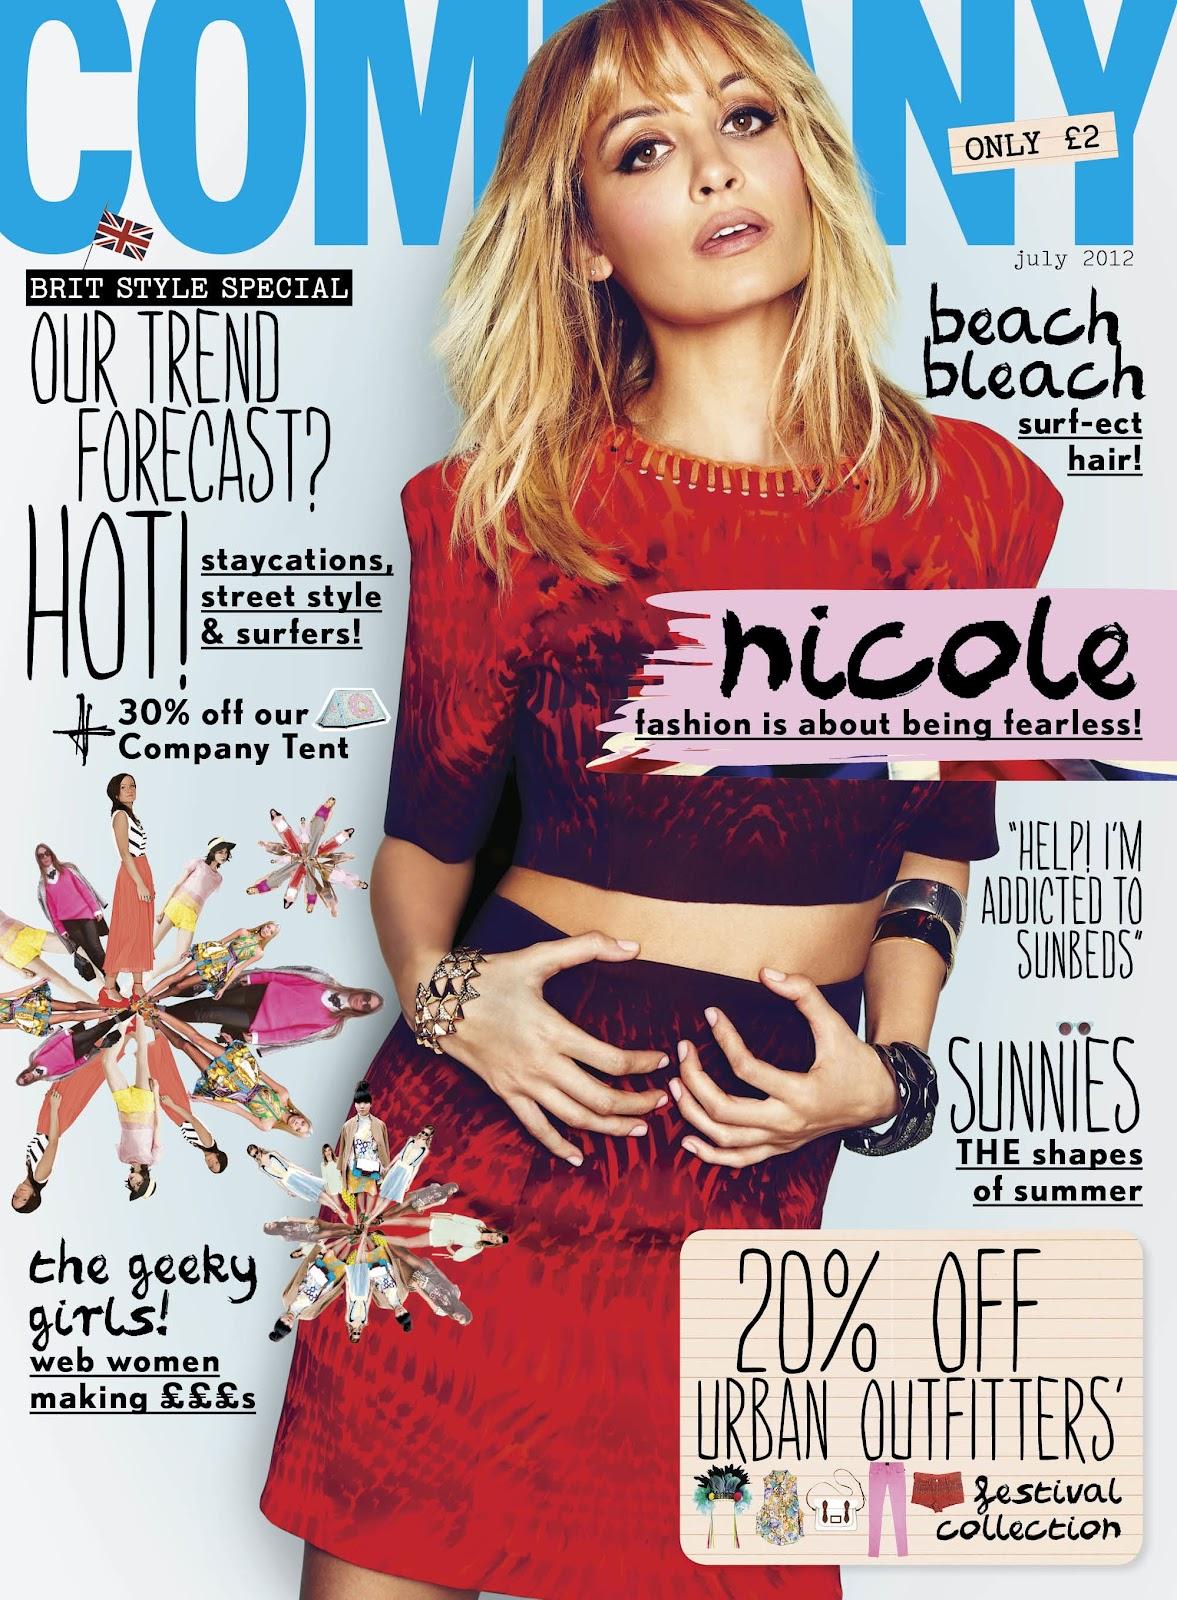 http://4.bp.blogspot.com/-jZ8HoG0__h8/T9Hkf2YoF5I/AAAAAAAAFpc/xrxgGwFFNdM/s1600/Nicole_Richie_Company_magazine_cover.jpg